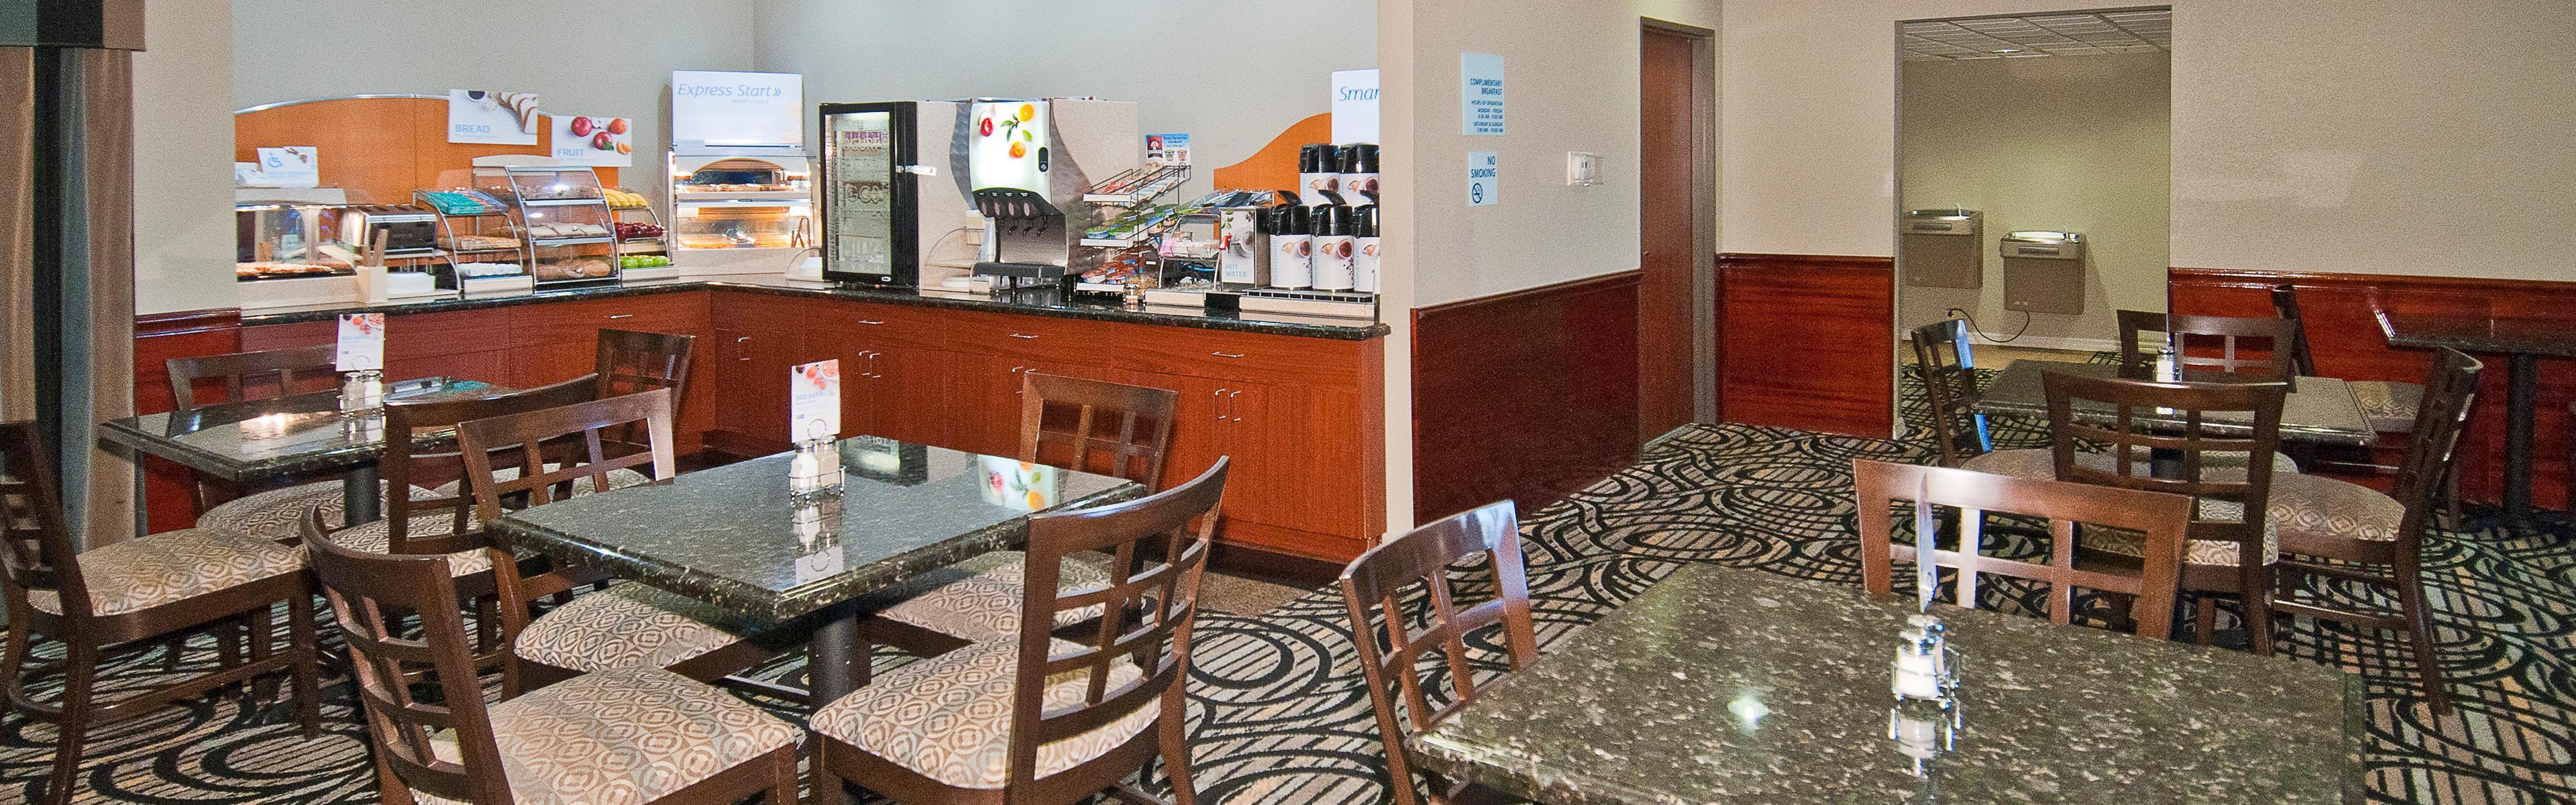 Holiday Inn Express & Suites Lake Charles image 3